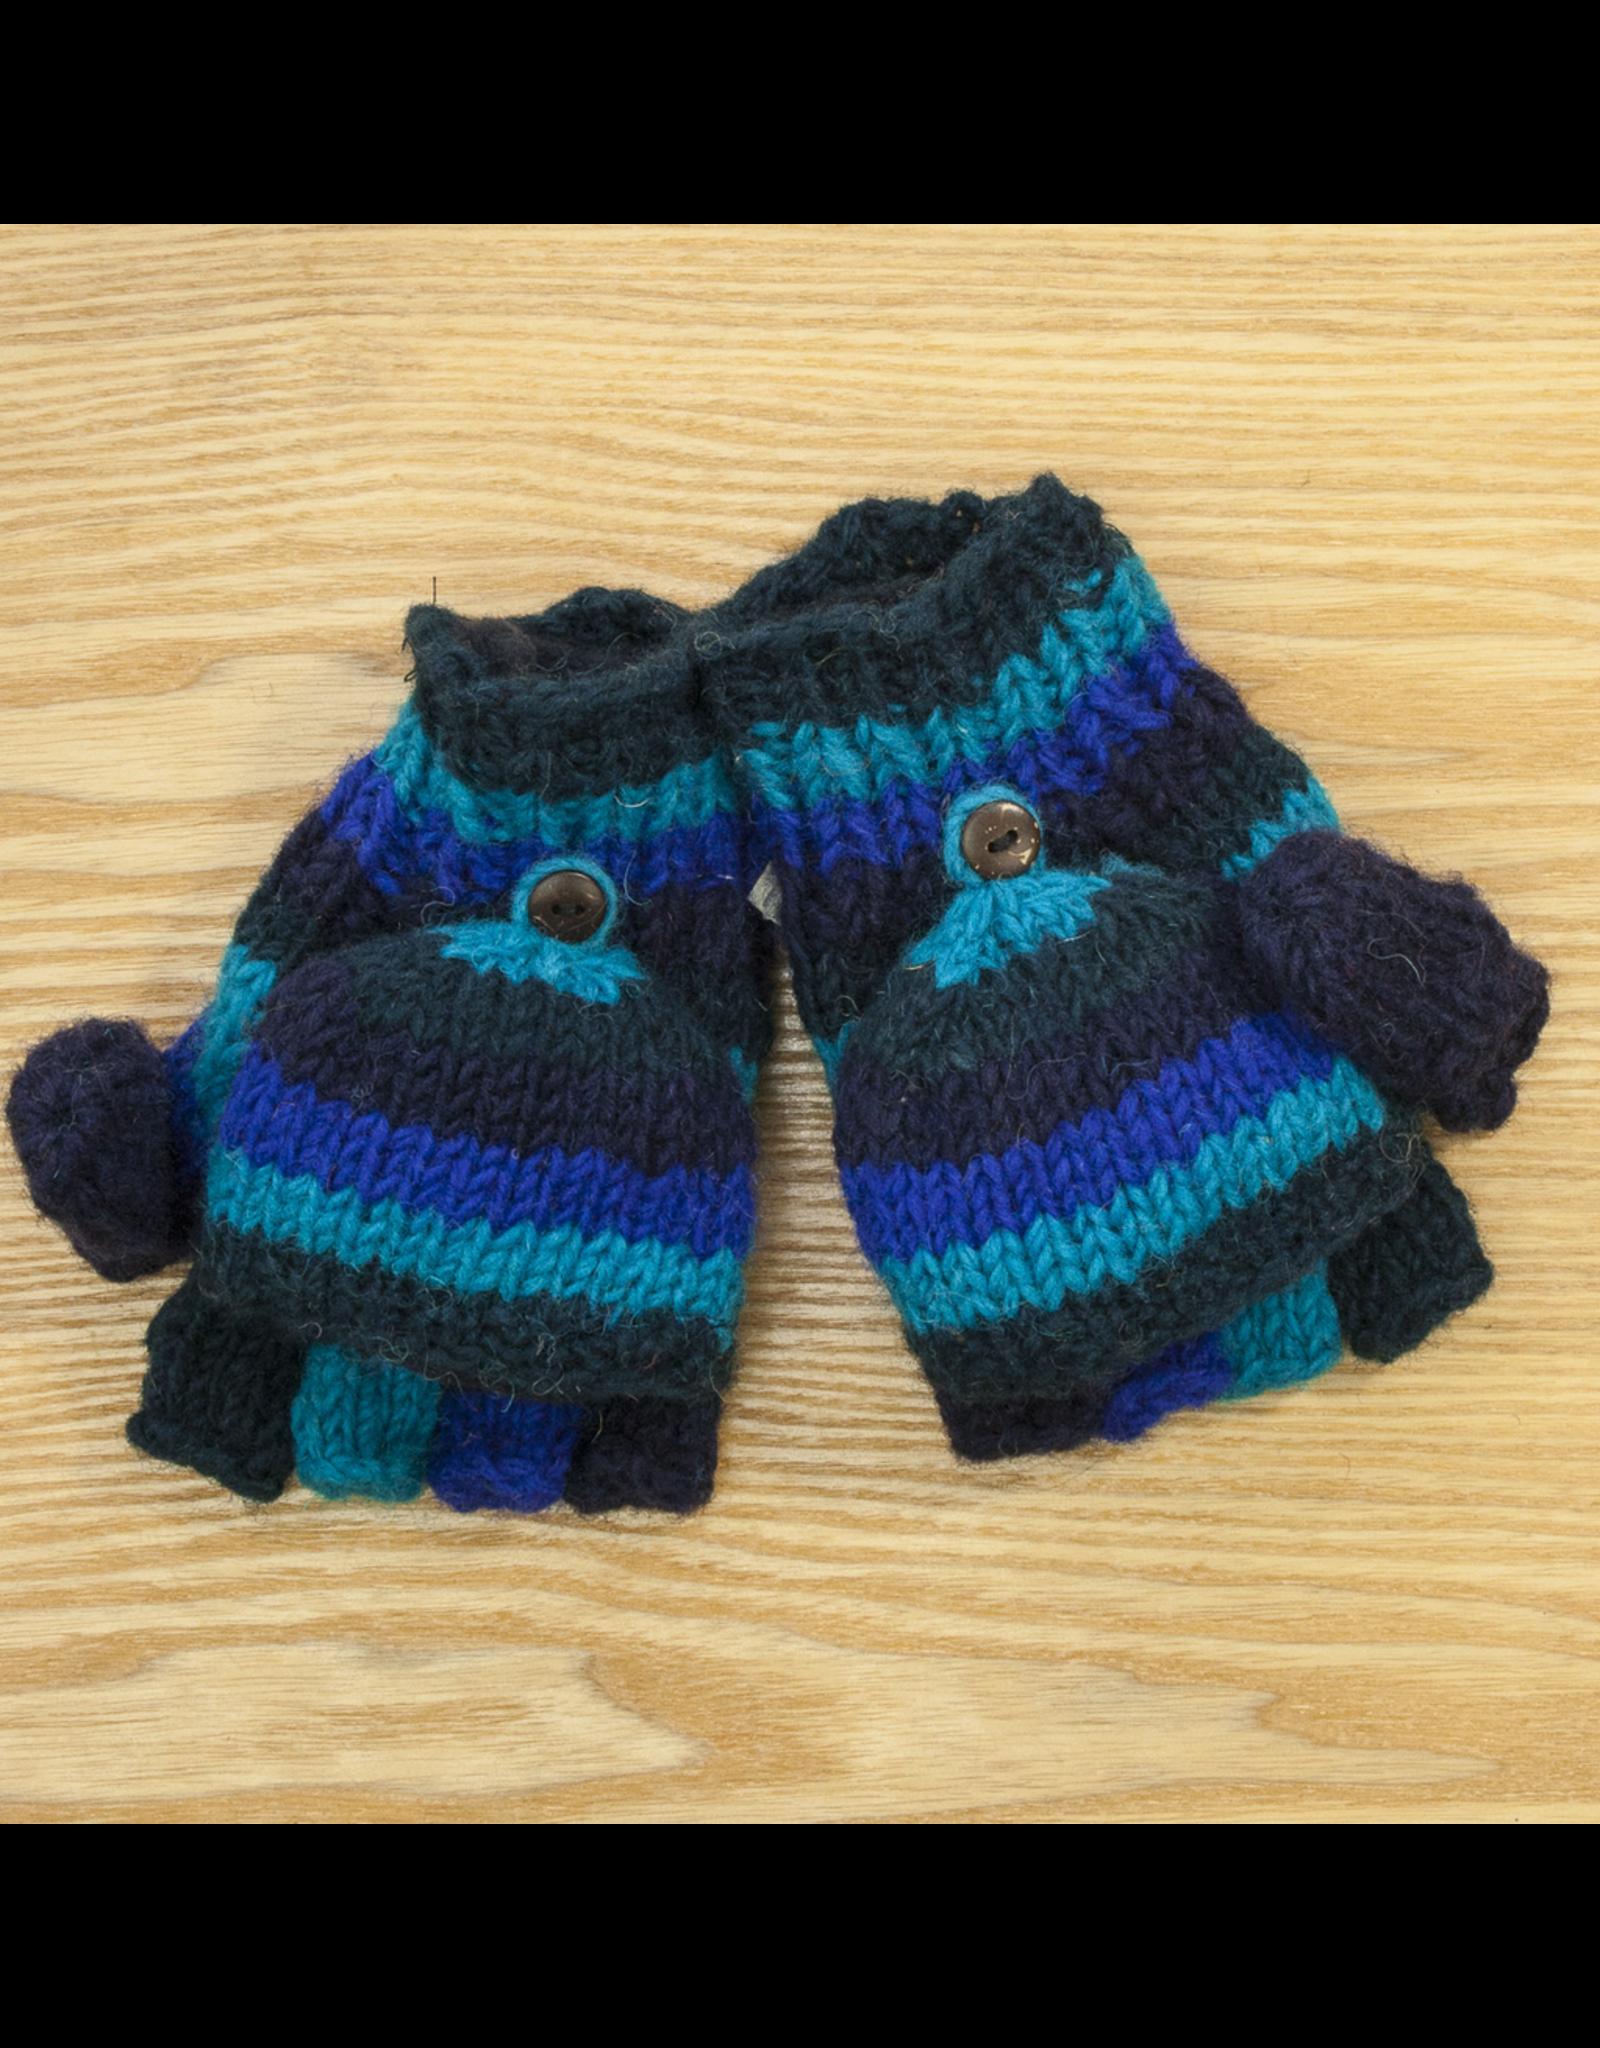 The Sweater Venture Children's Snowfox Fleece Lined Convertibles